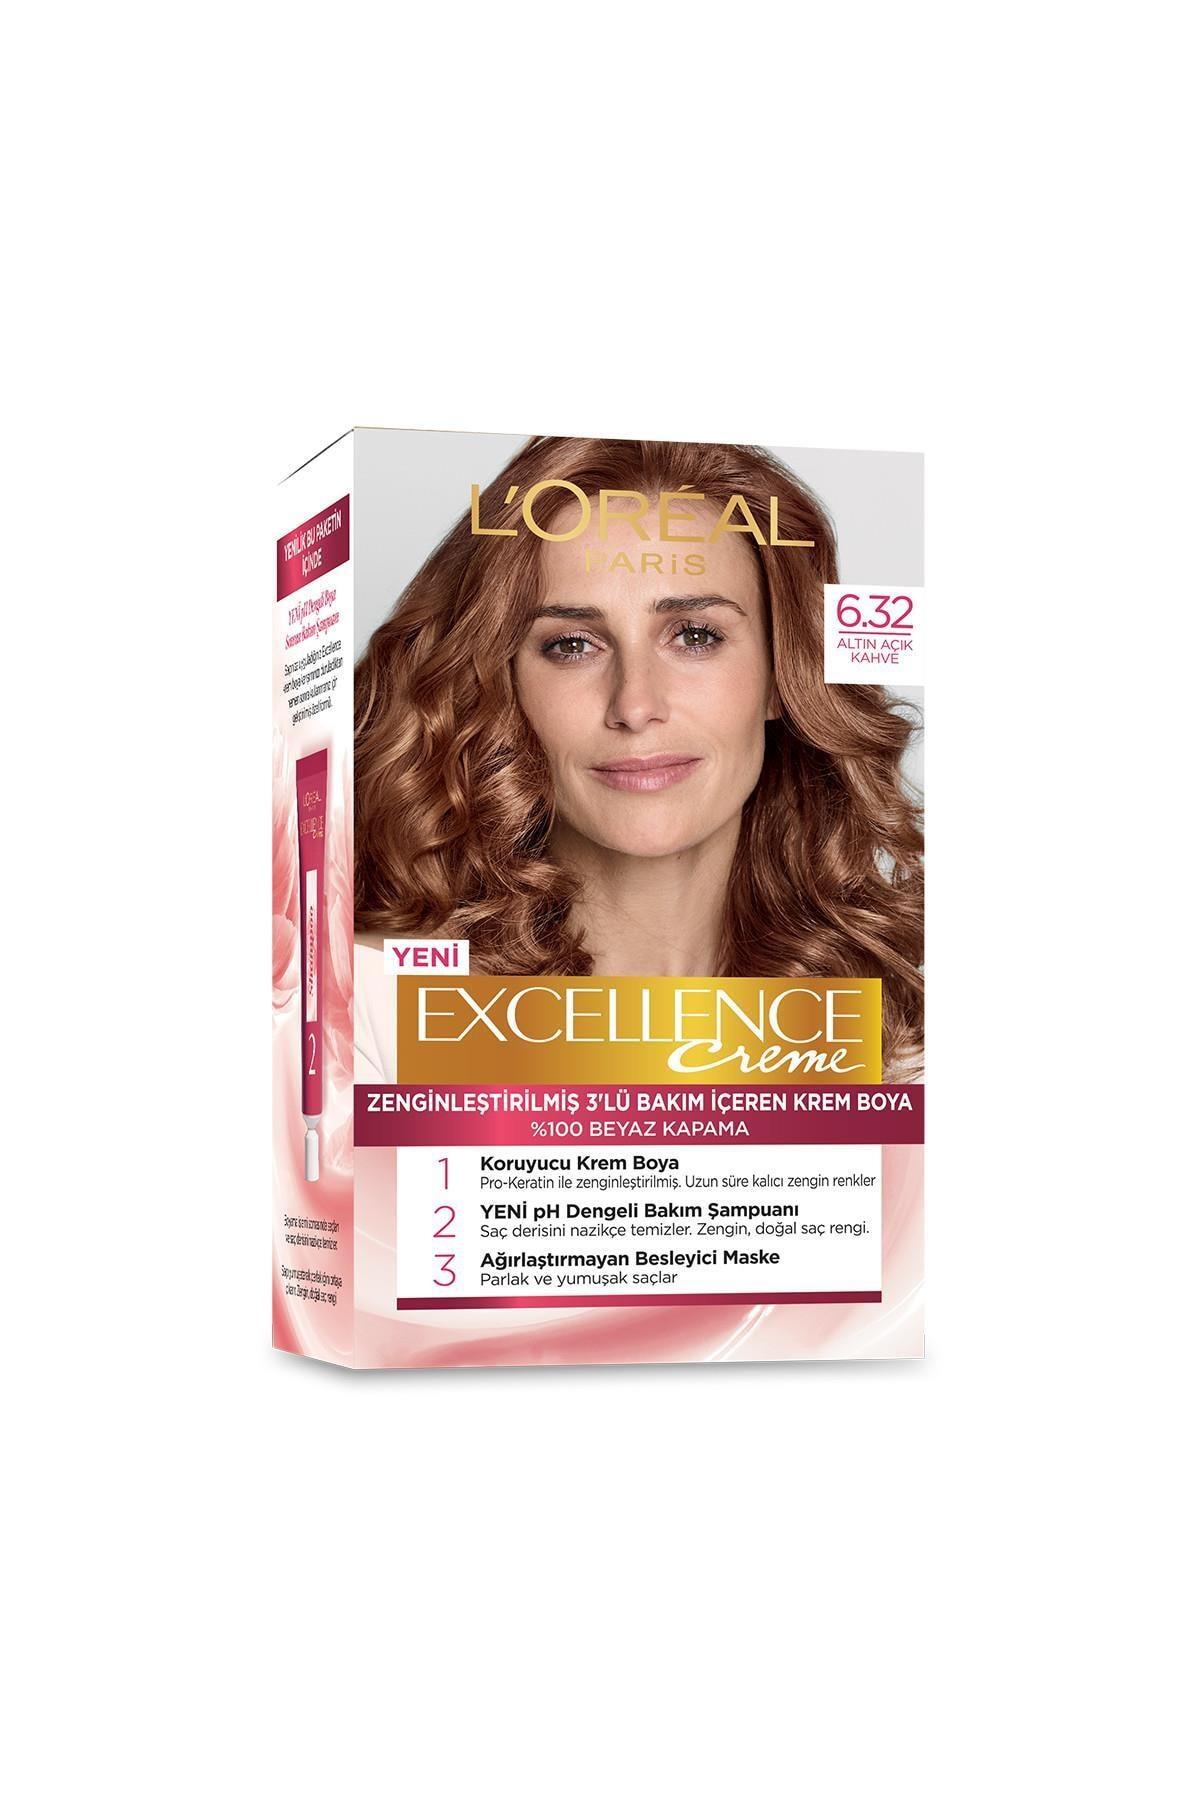 L'Oreal Paris Saç Boyası - Excellence Creme 6.32 Altın Açık Kahve 3600522378006 1